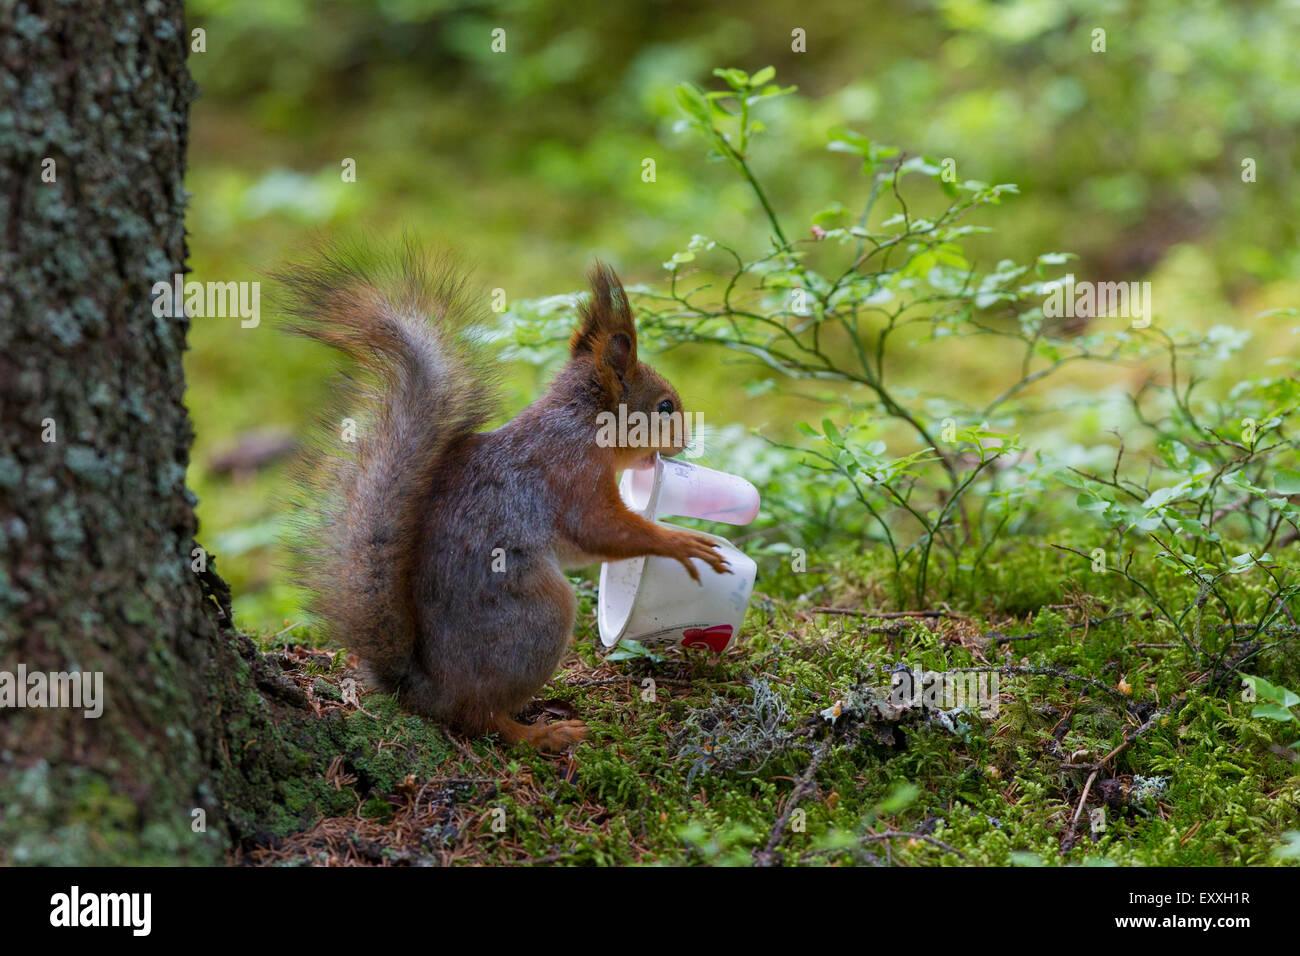 Eurasian red squirrel (Sciurus vulgaris) feeding on discarded plastic yoghurt cup - Stock Image